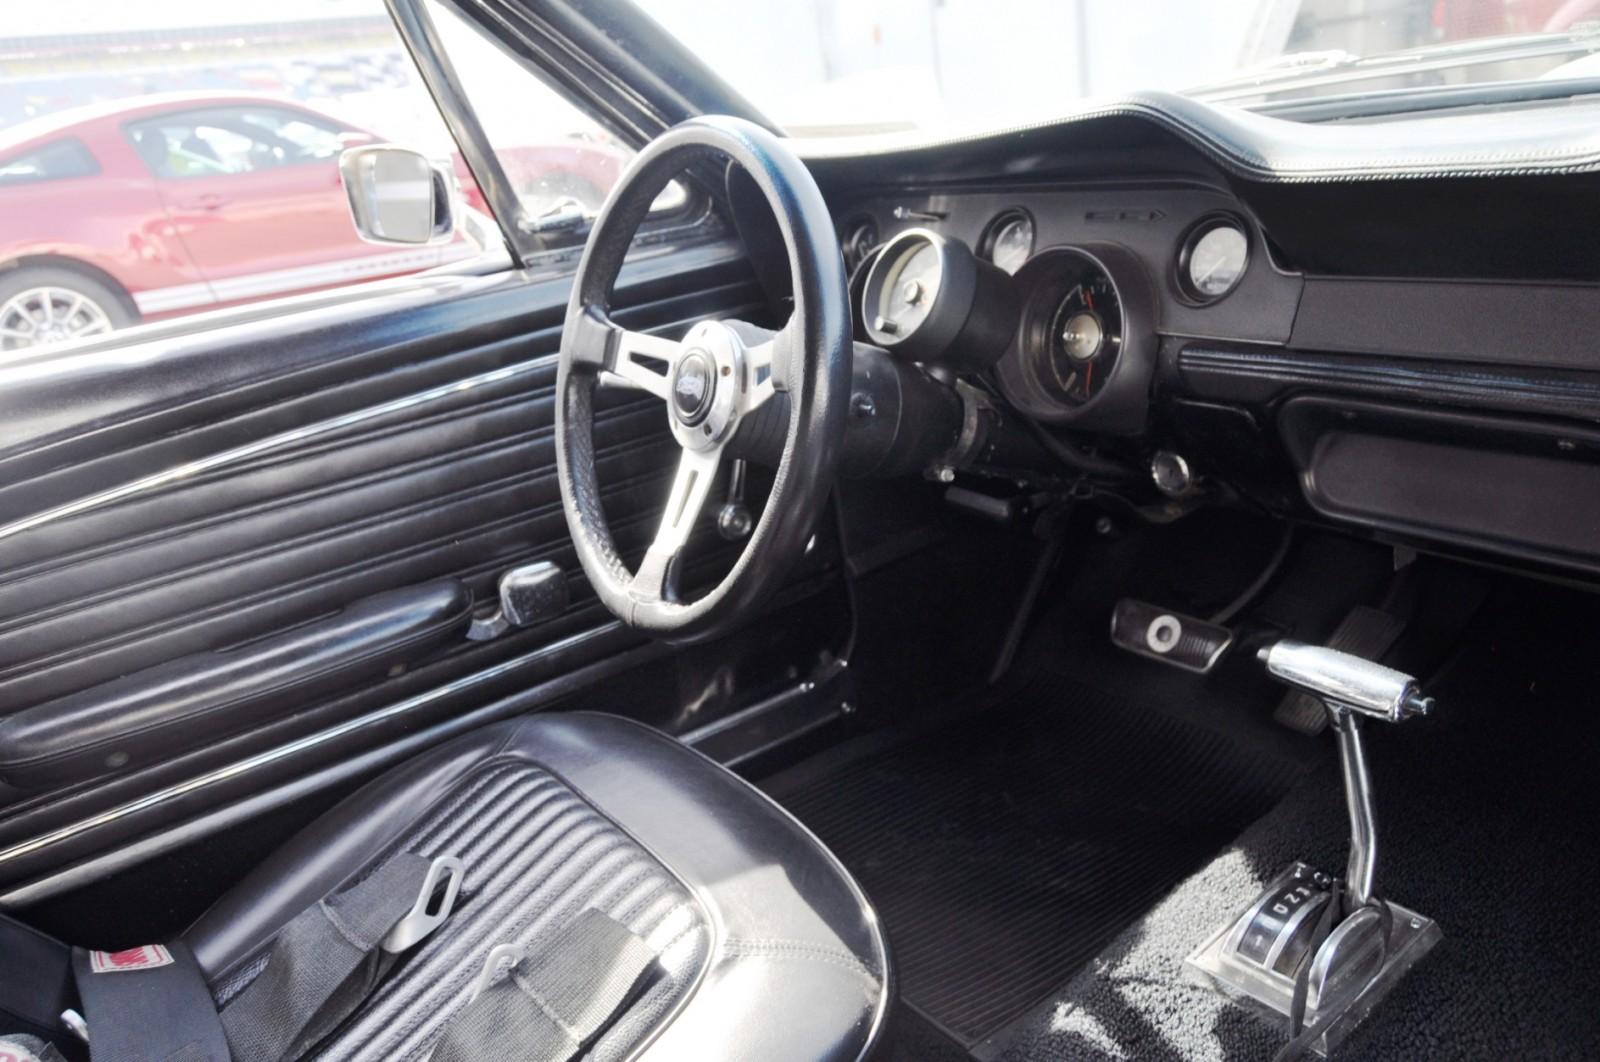 1968 Ford Drag Team - Mustang 428 Cobra Jet 19